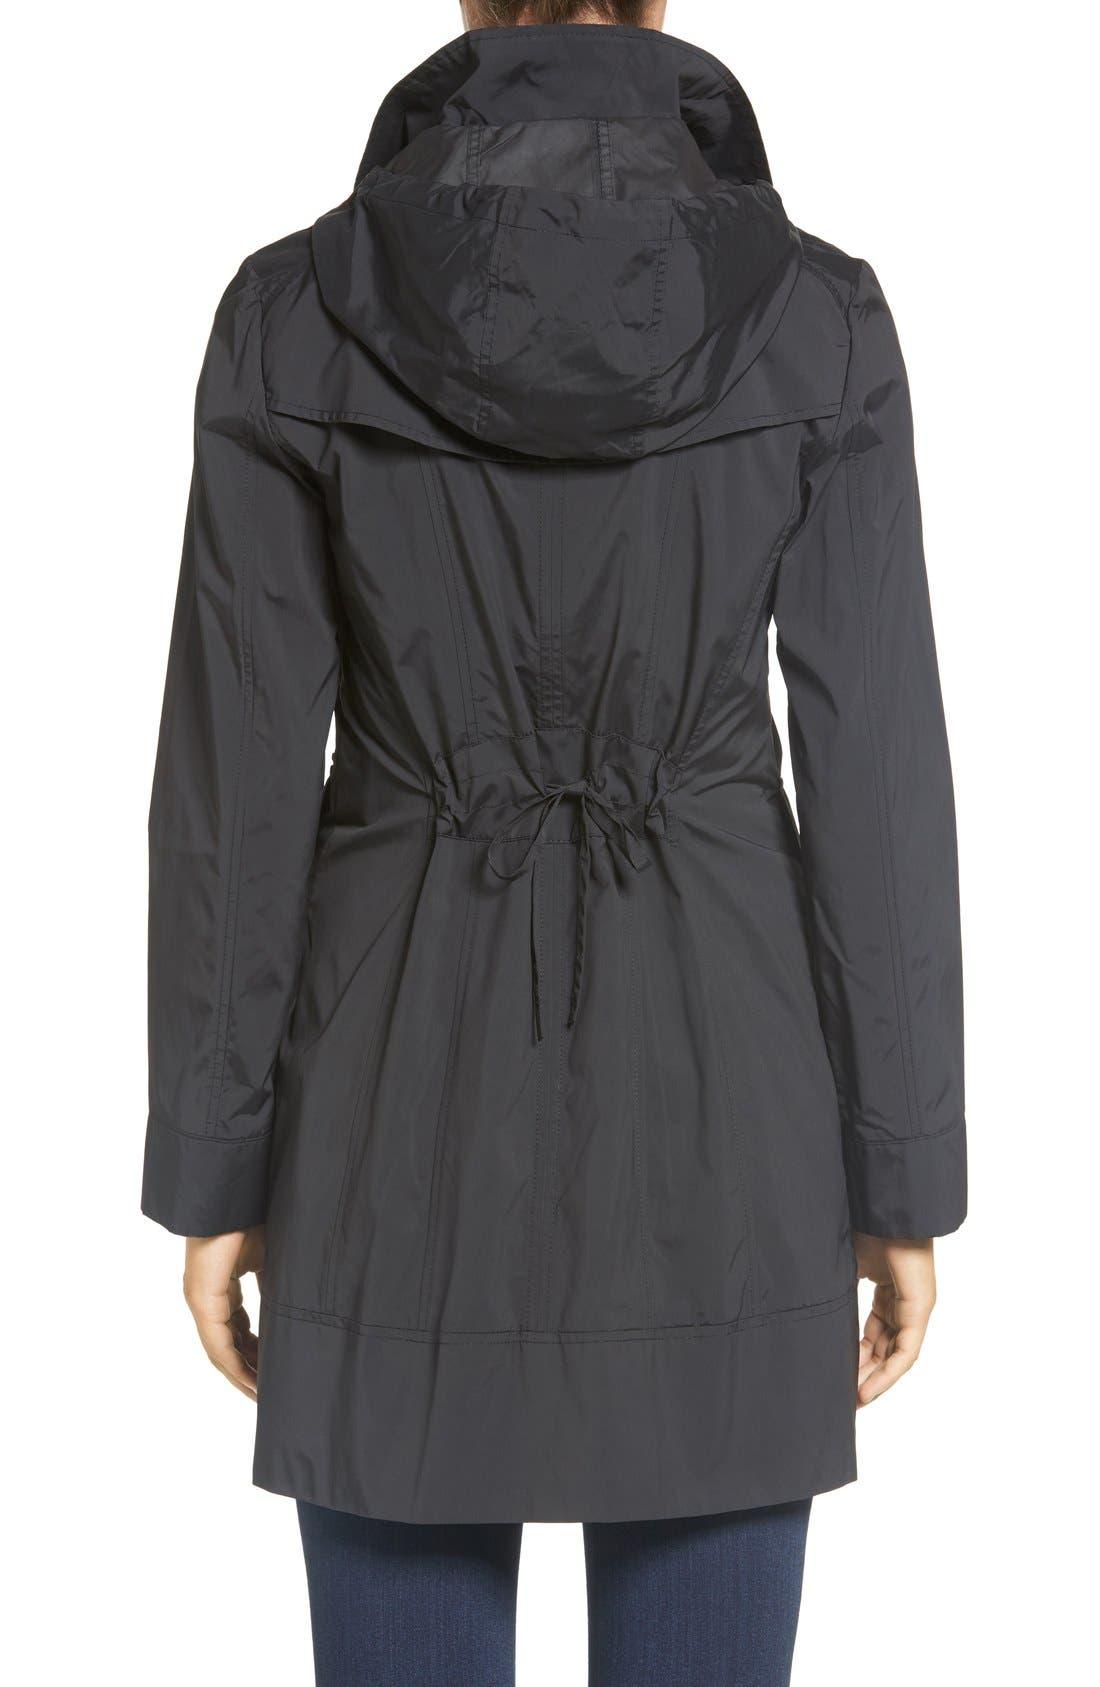 COLE HAAN SIGNATURE, Back Bow Packable Hooded Raincoat, Alternate thumbnail 6, color, BLACK